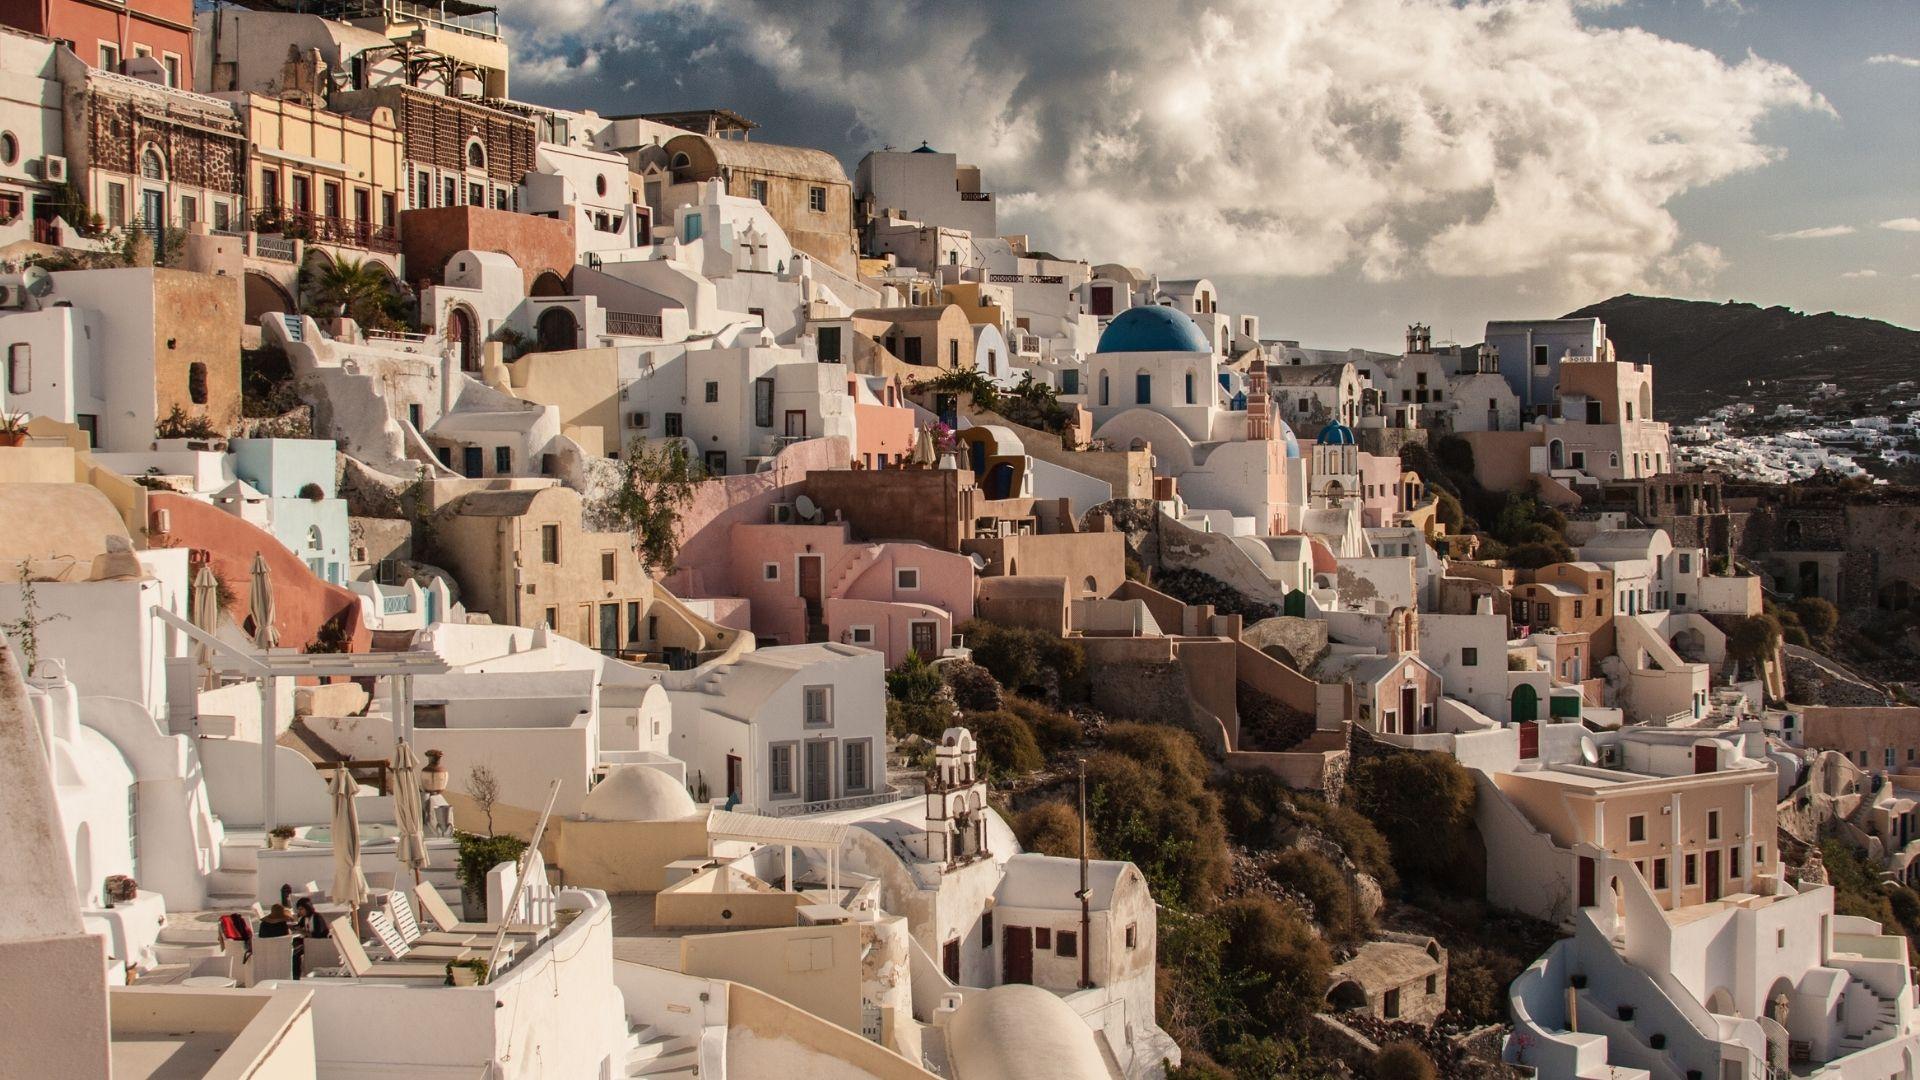 Yunanistan Vizesi: Randevu ve Başvuru (2021) 3 – yunanistan 9